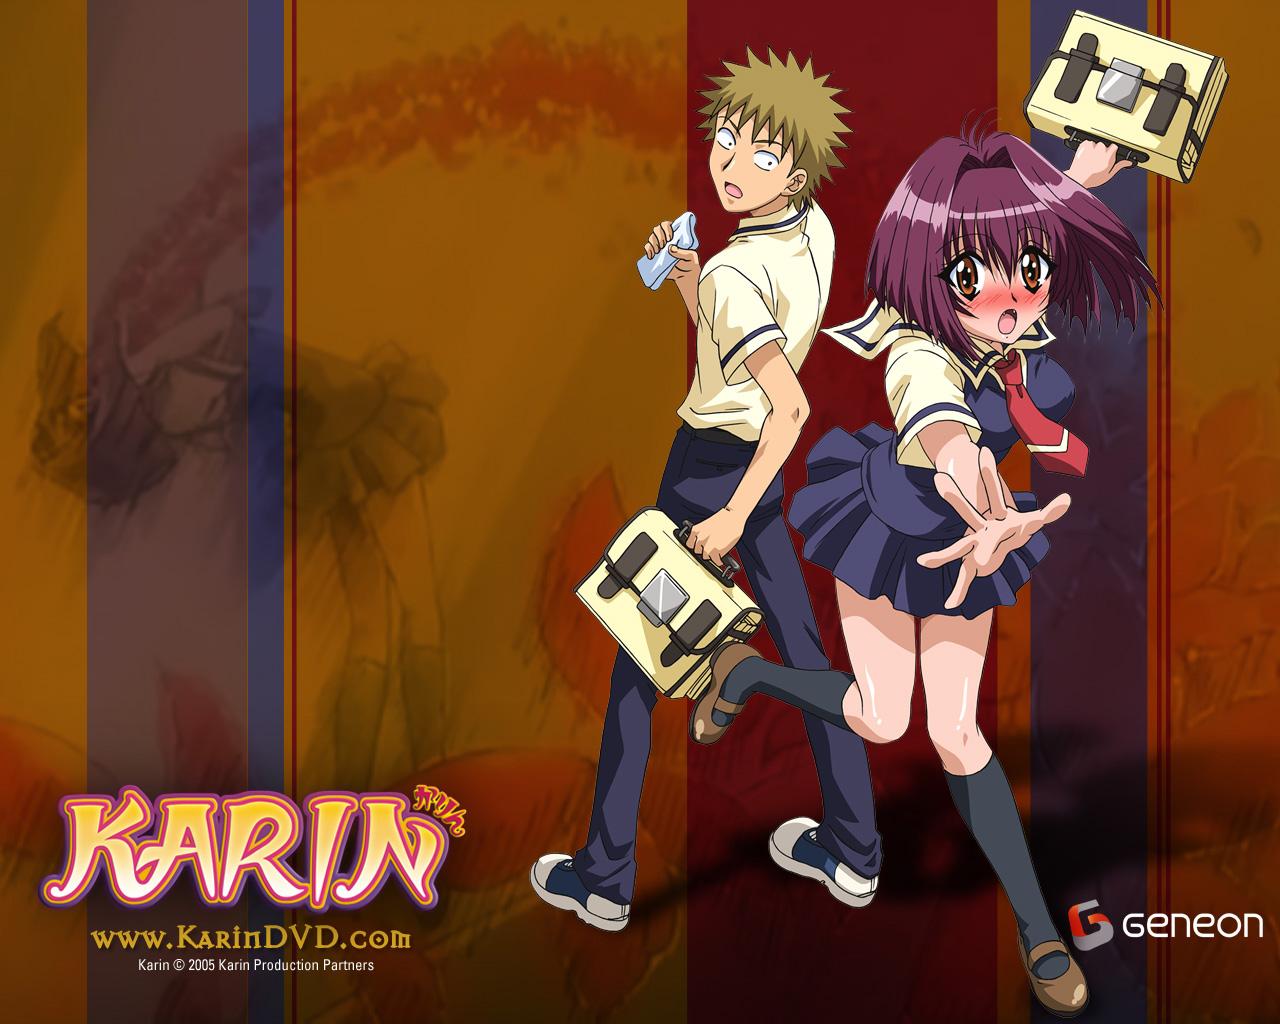 karin (manga) - kagesaki yuna - image #8512 - zerochan anime image